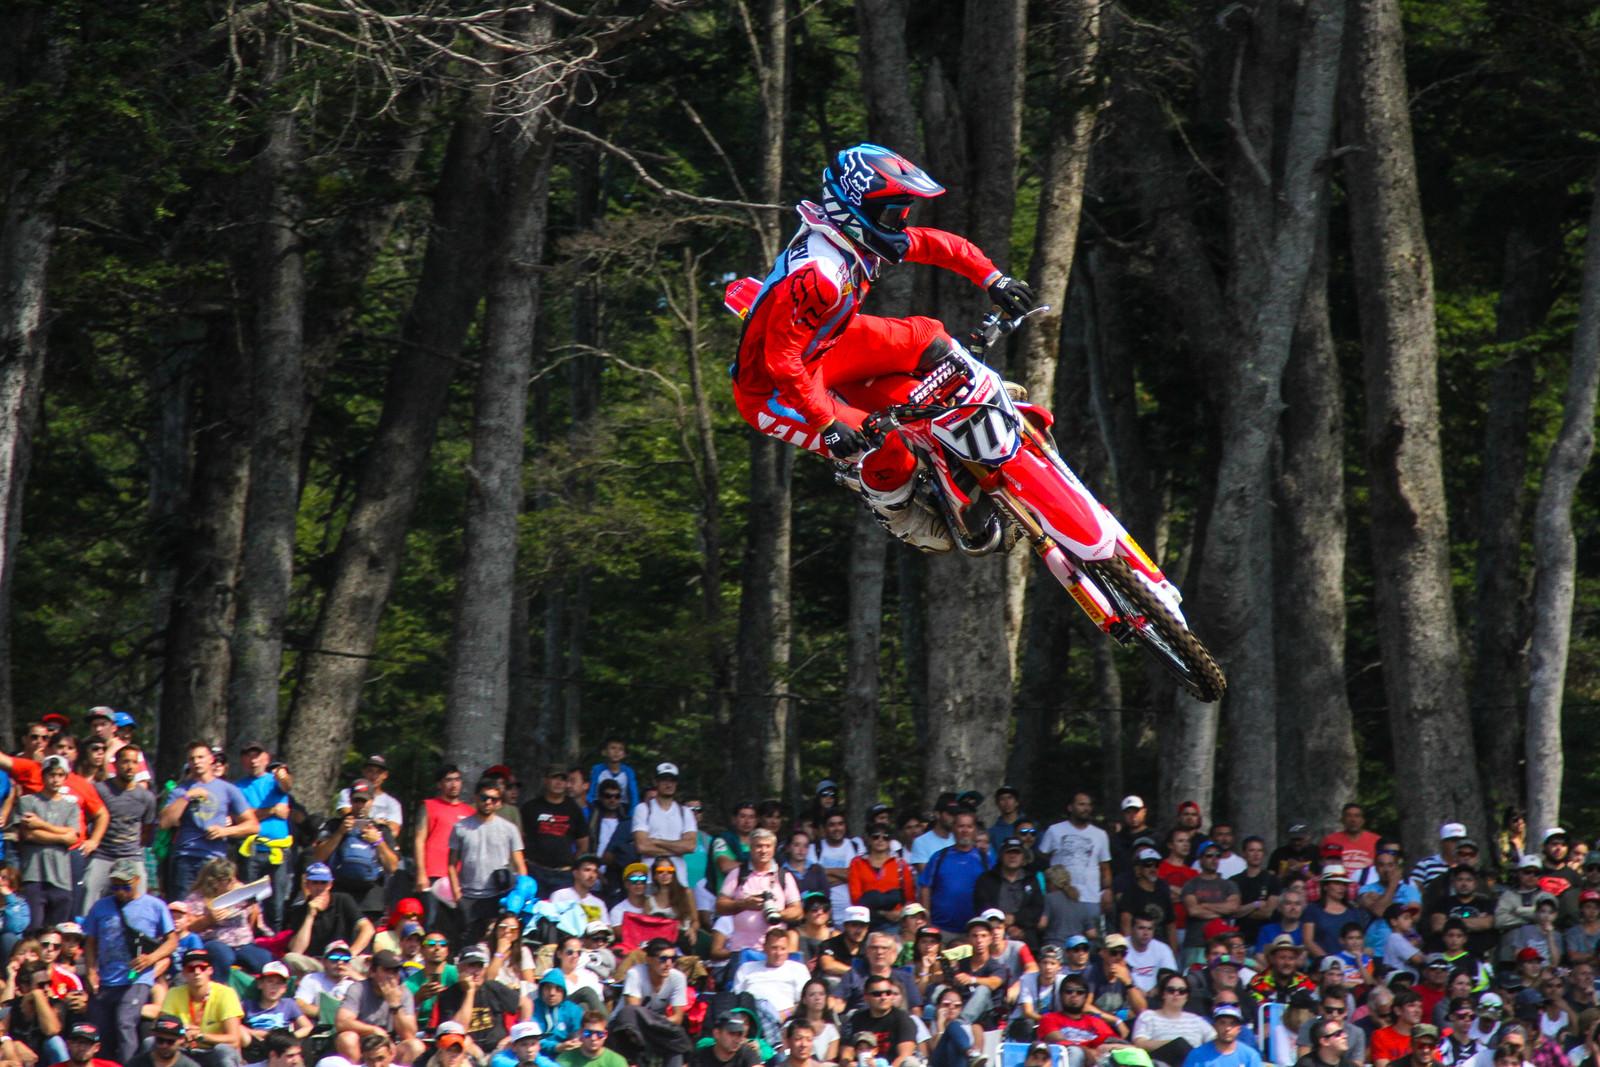 Evgeny Bobryshev - Photo Blast: 2017 MXGP of Argentina - Motocross Pictures - Vital MX